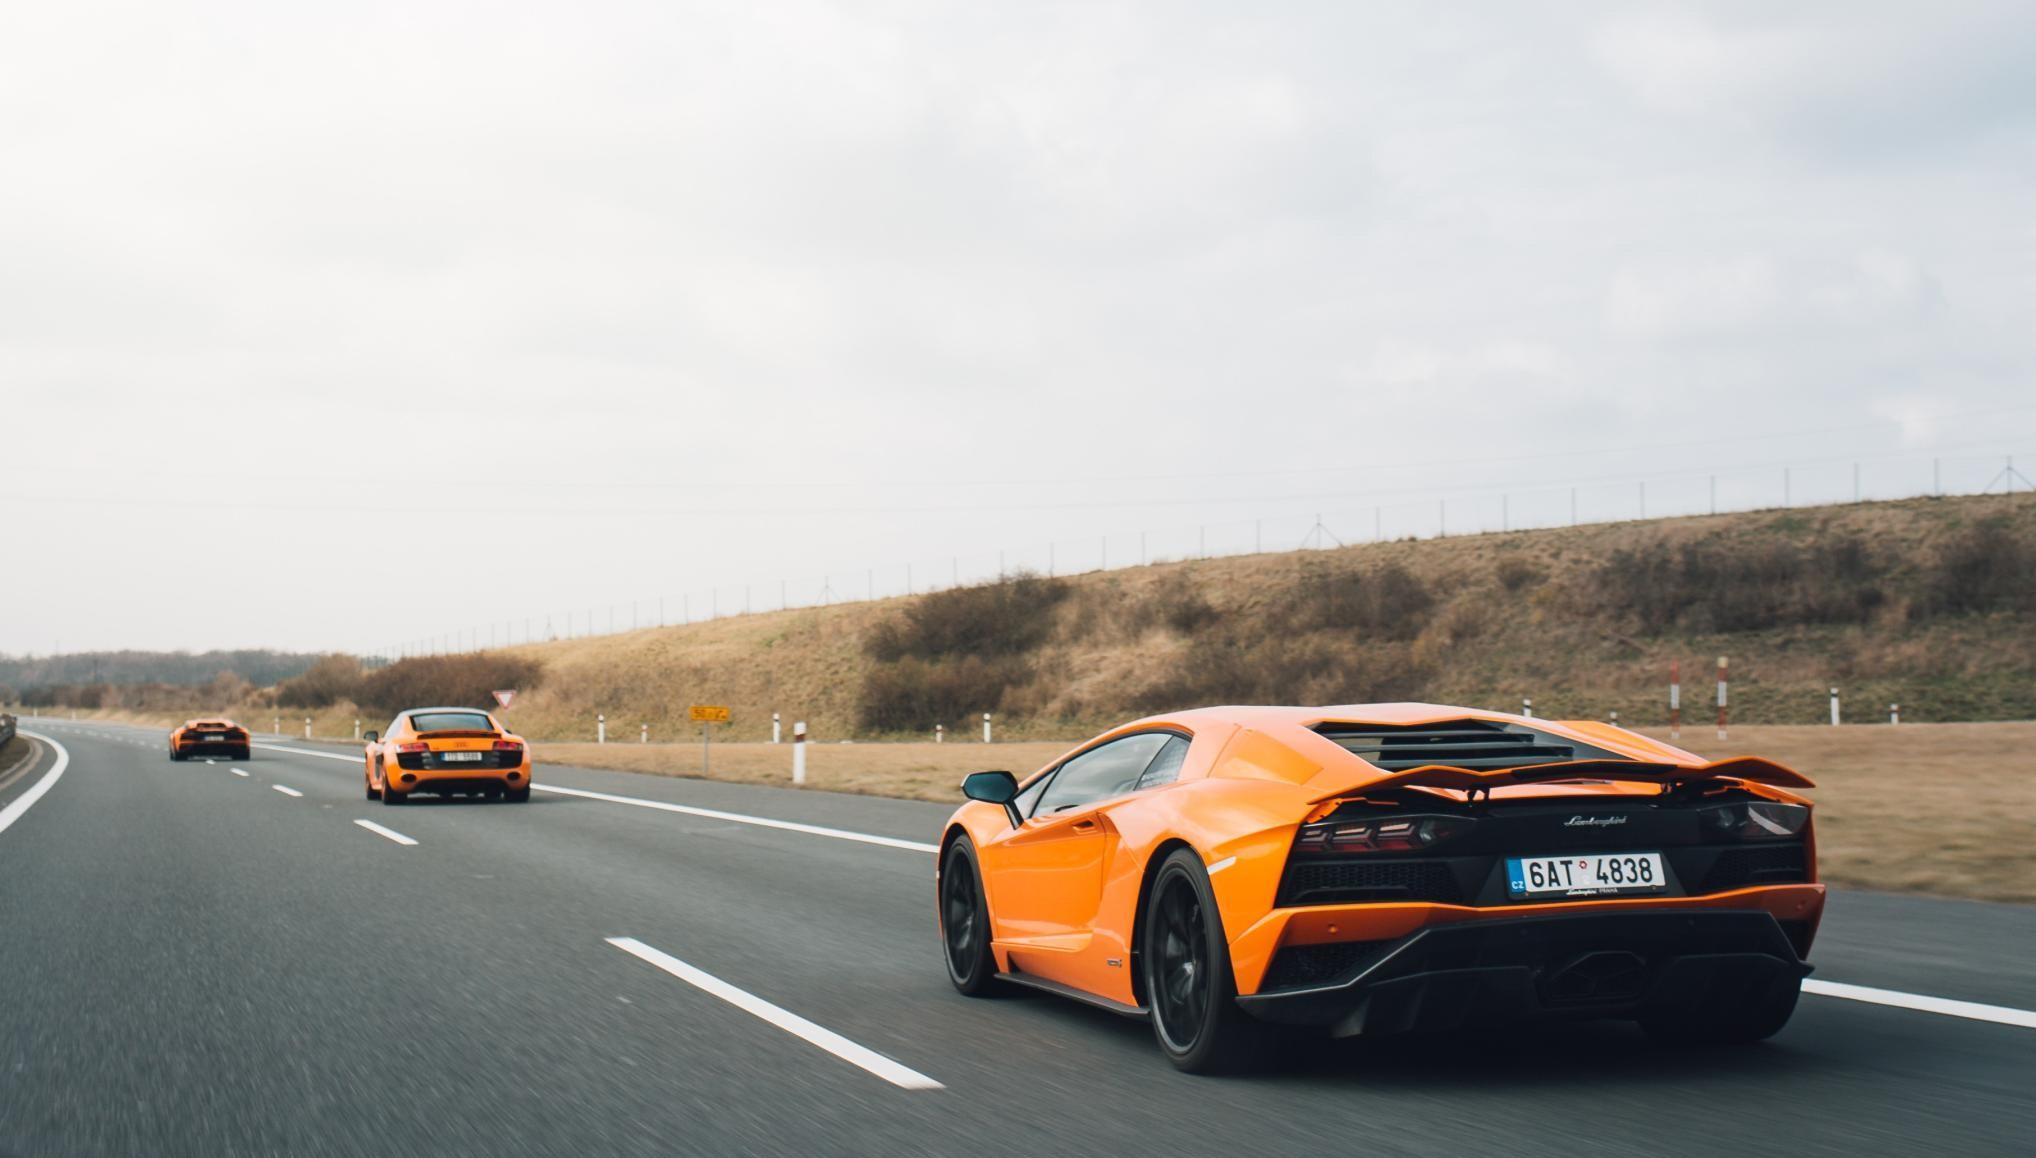 oranzinis-automobilis-geriau-matomas